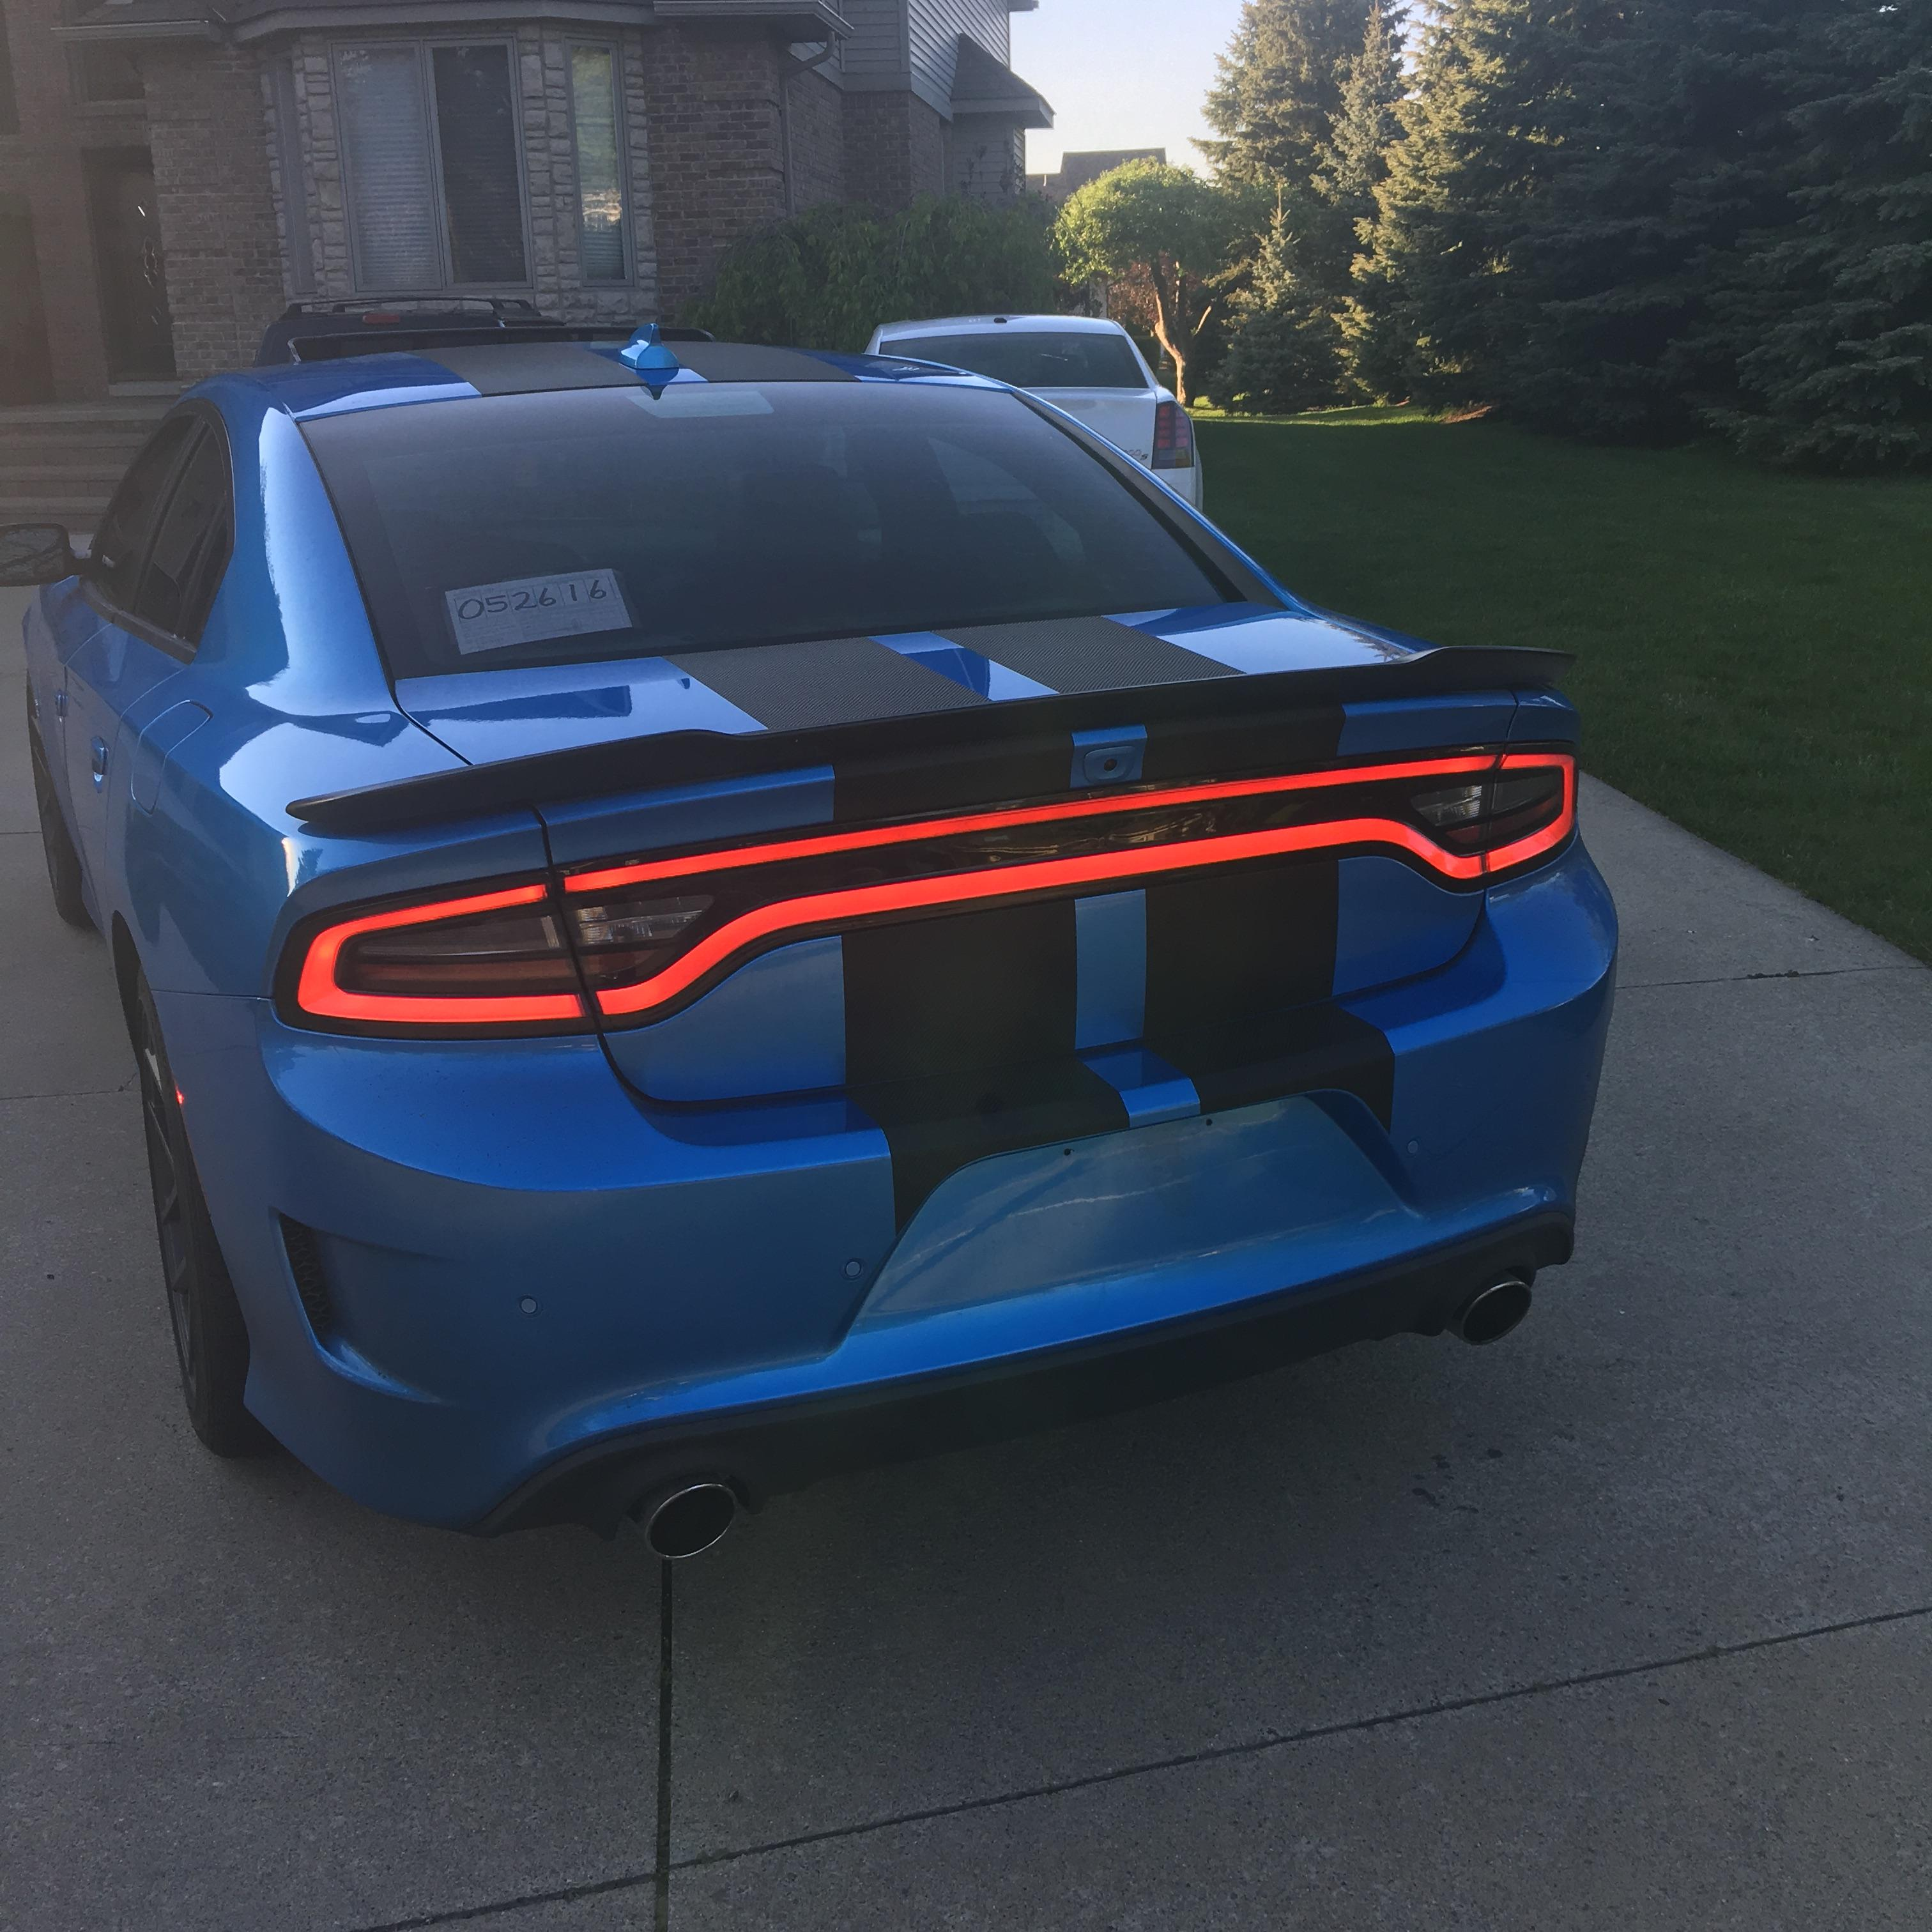 2016 Dodge Charger Scat Pack Gets Carbon Fiber Pattern Stripes: Hot or Not? - autoevolution